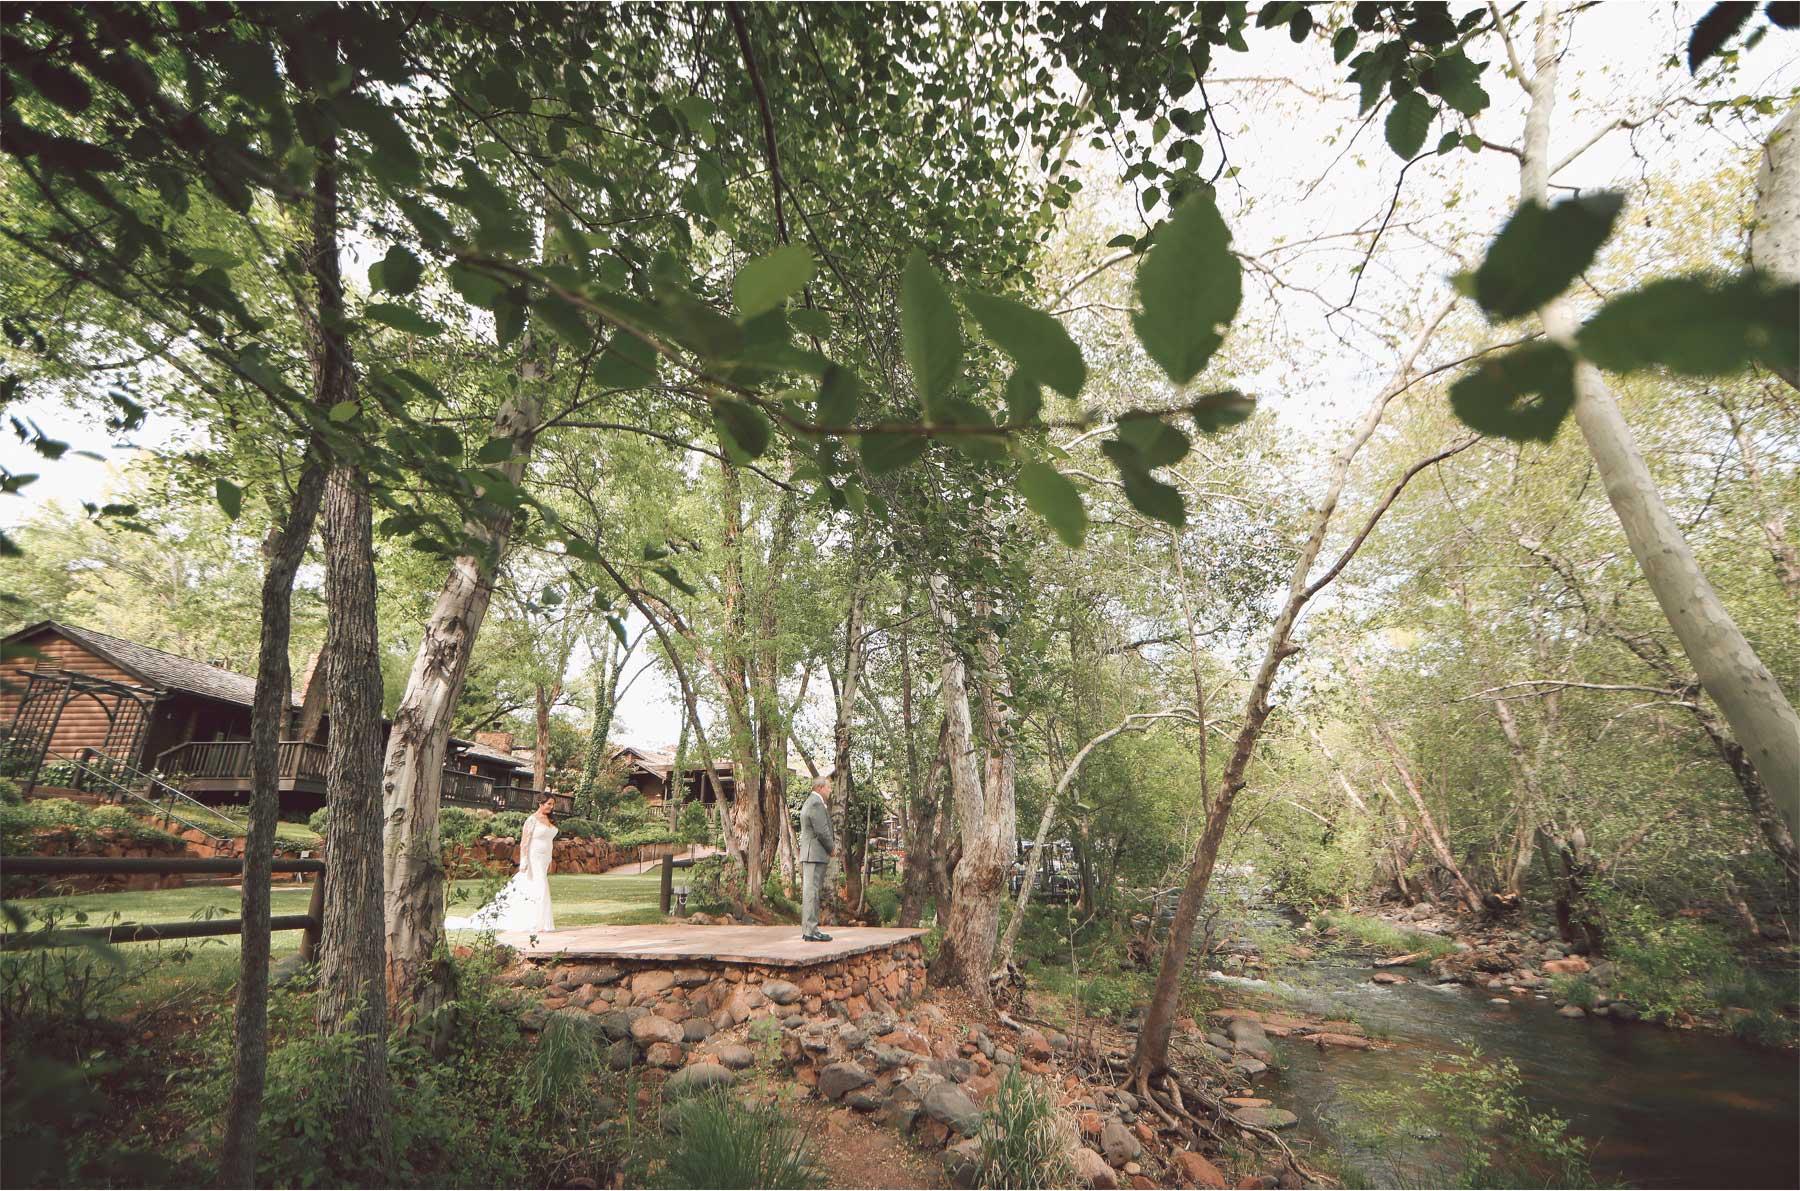 08-Sedona-Arizona-Wedding-Photographer-by-Andrew-Vick-Photography-Spring--LAuberge-de-Sedona-Resort-First-Meeting-Look-Bride-Groom-Creek-Vintage-Barbara-and-Mike.jpg